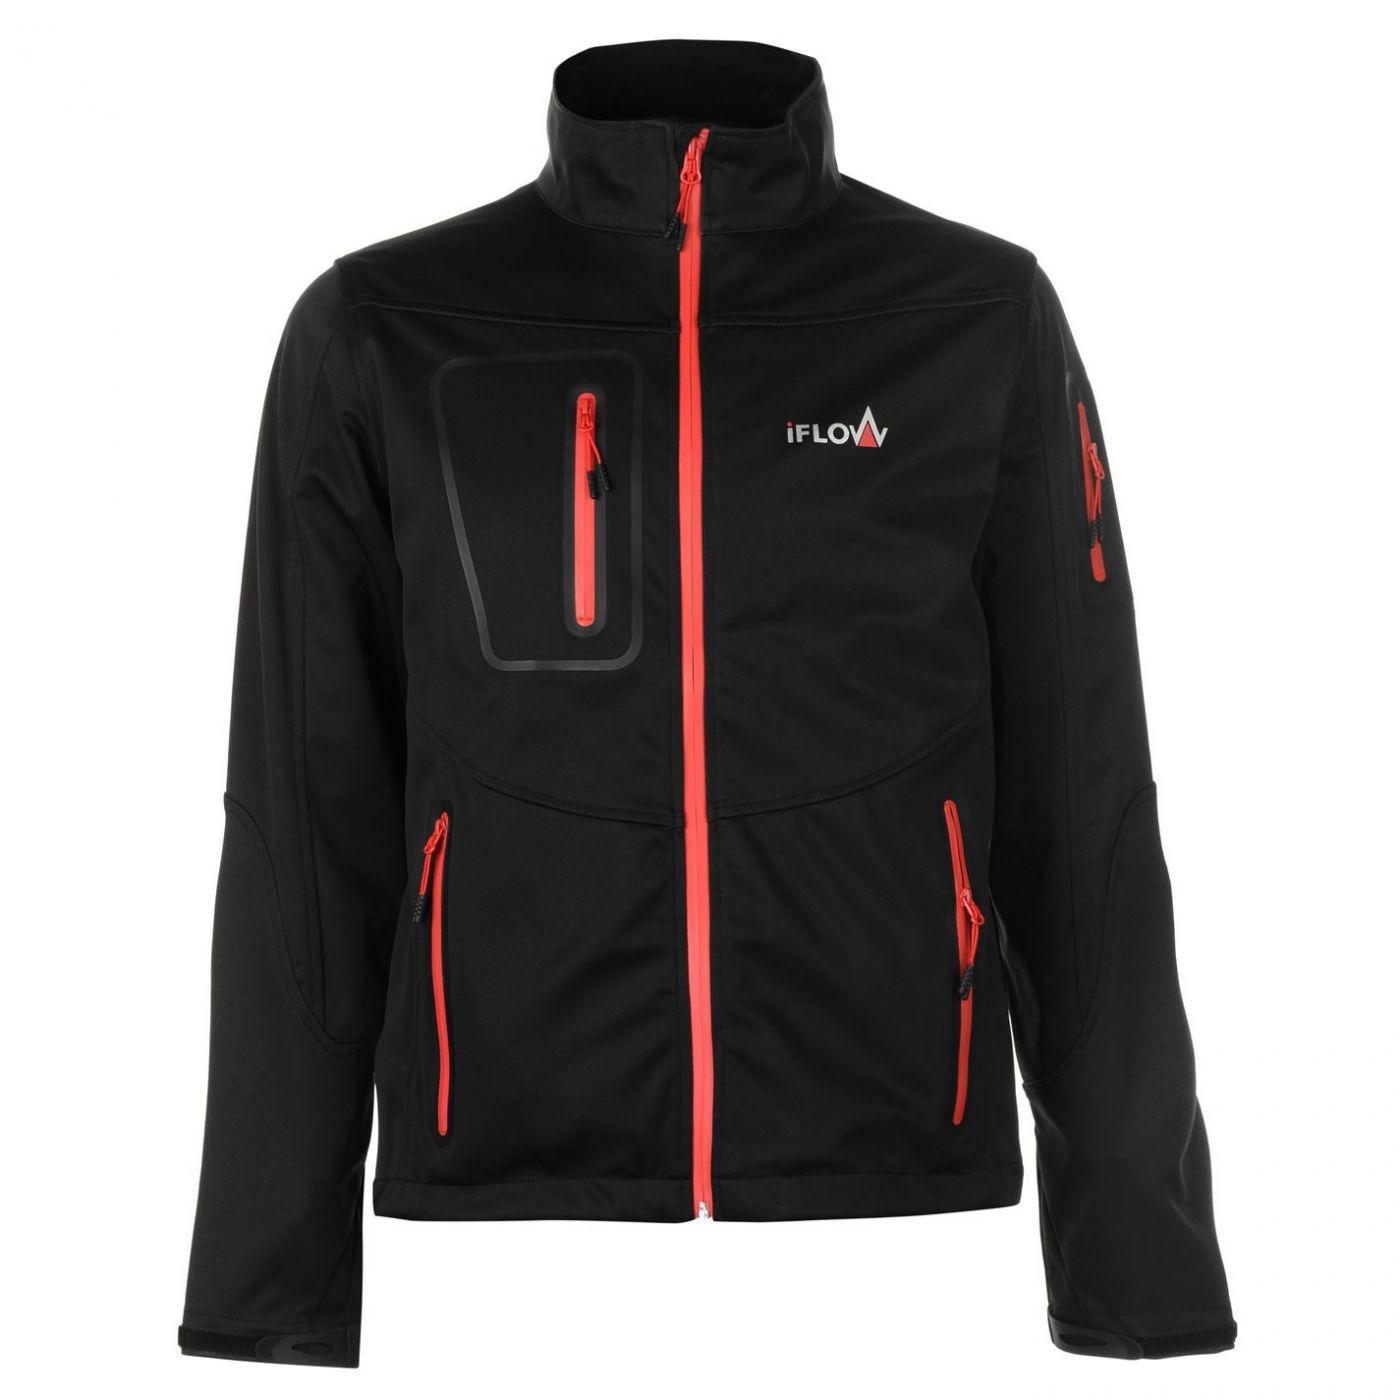 IFlow Softshell Jacket Mens